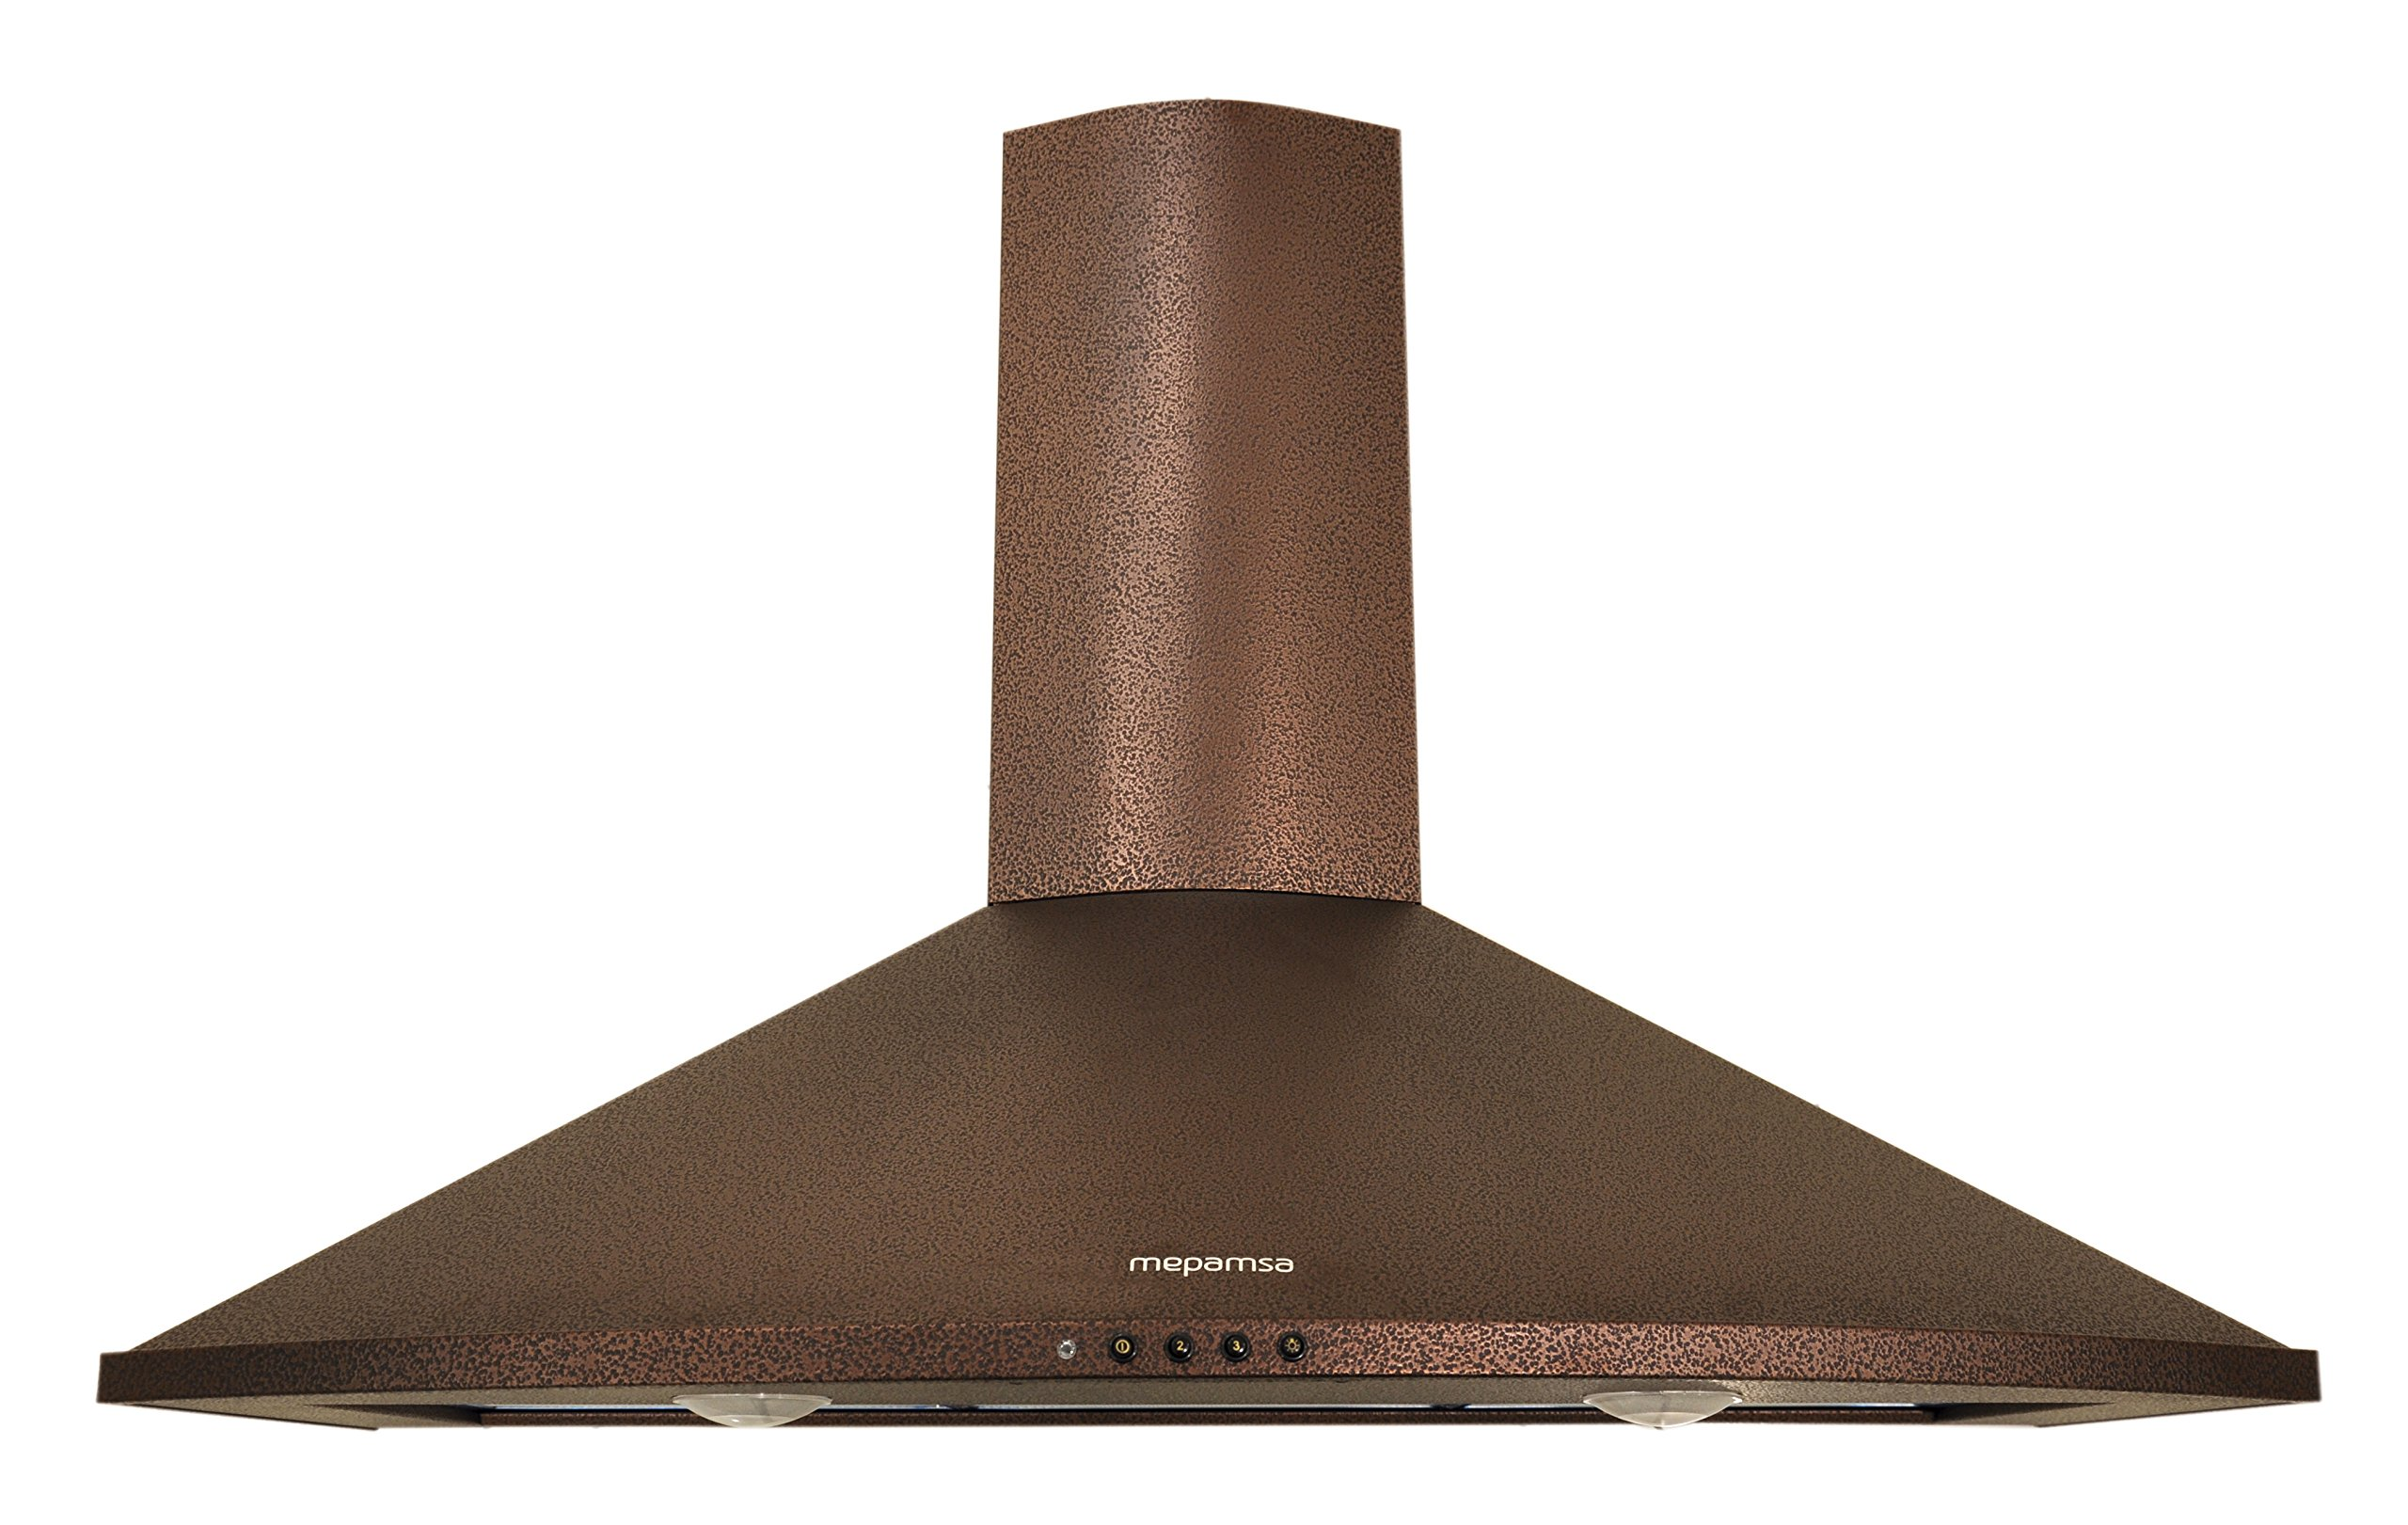 815OTvpLcaL - Mepamsa Tender H 60 V2 - Campana aspirante decorativa de pared, cobre